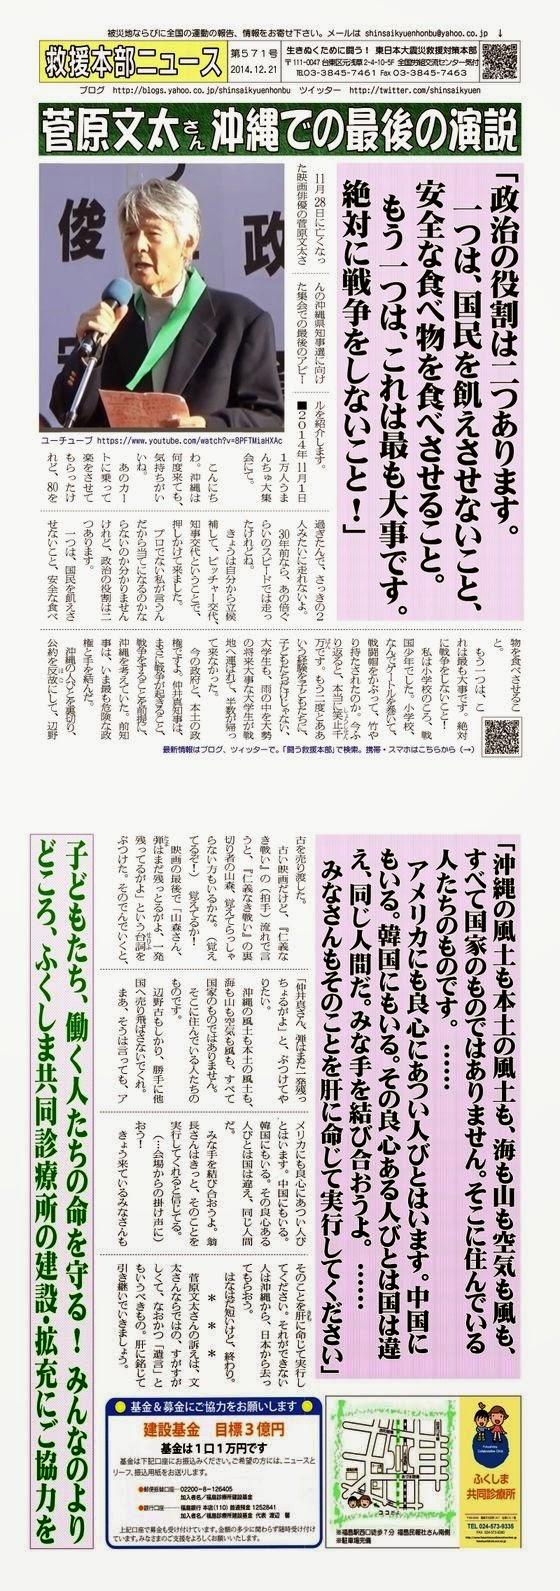 http://www.geocities.jp/shinsaikyuenhonbu/honbu571.pdf